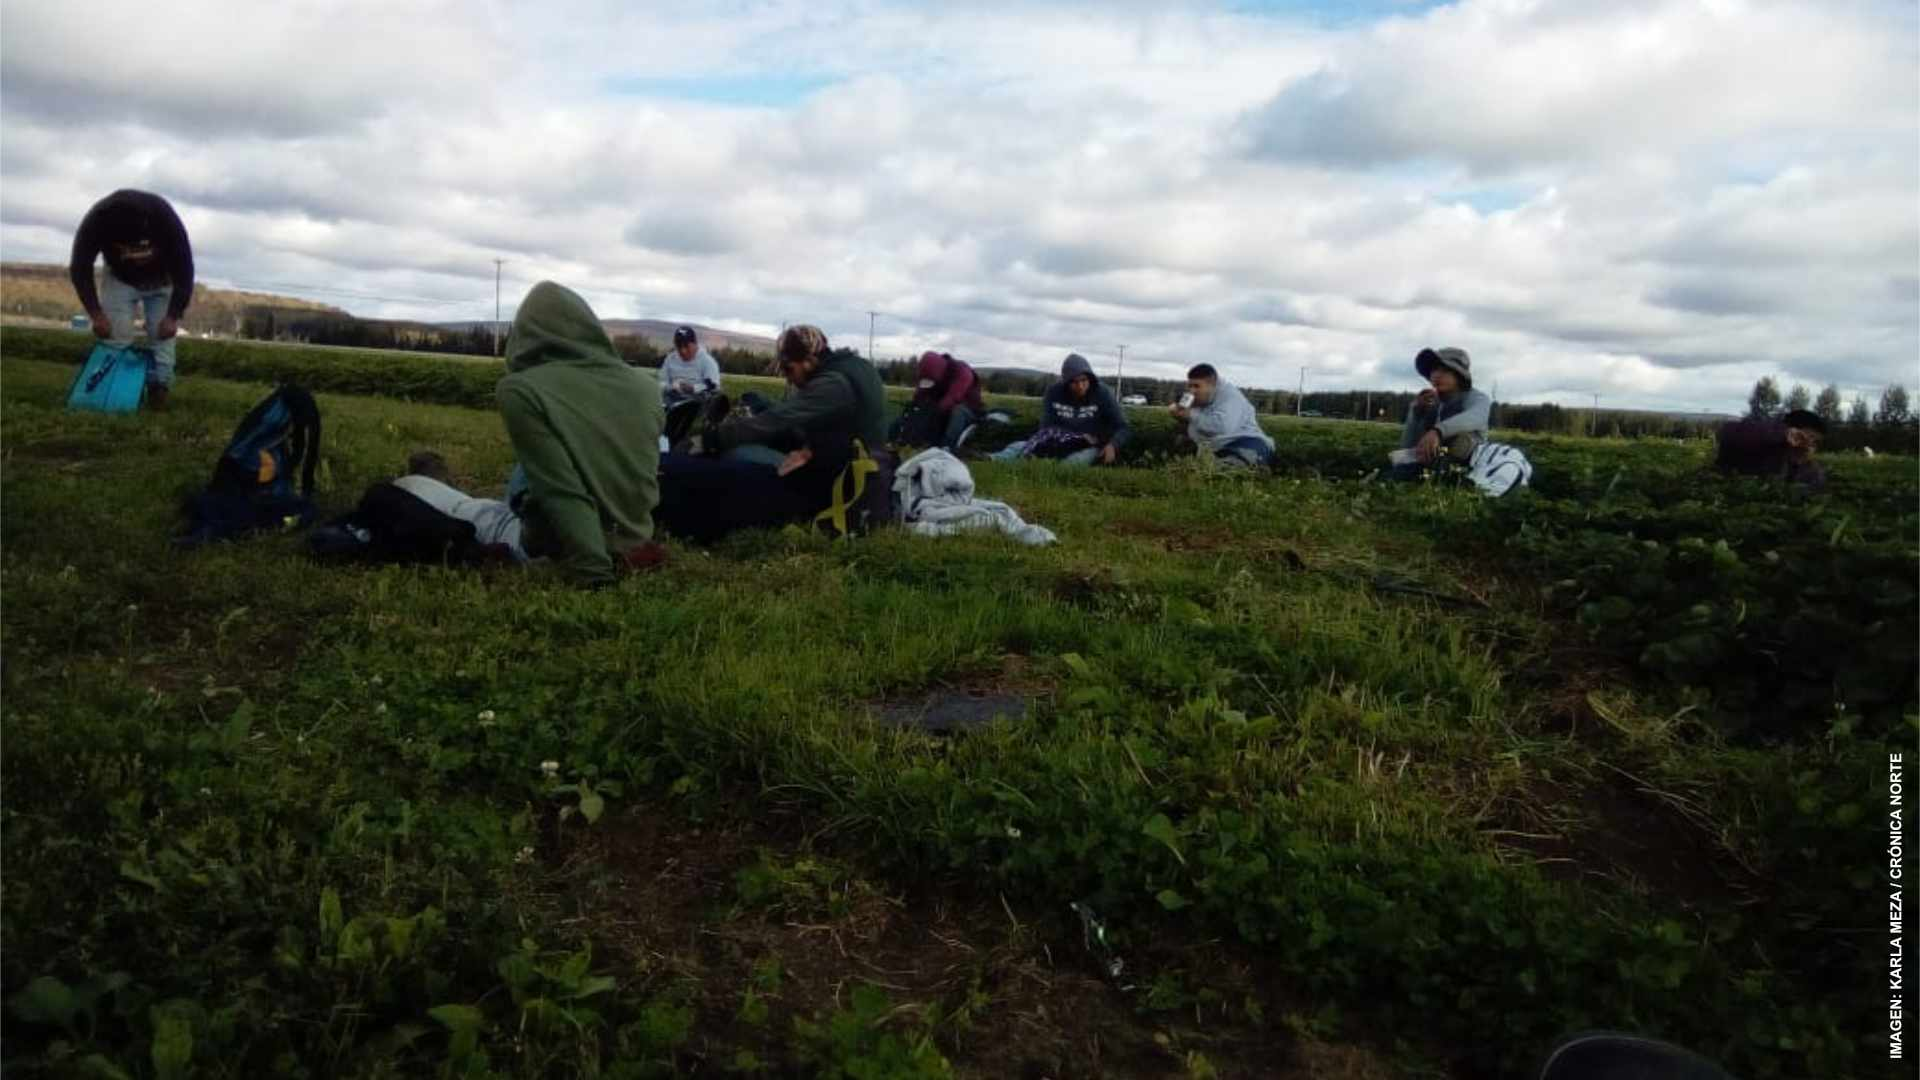 Trabajadores agrícolas extranjeros huyen de maltratos